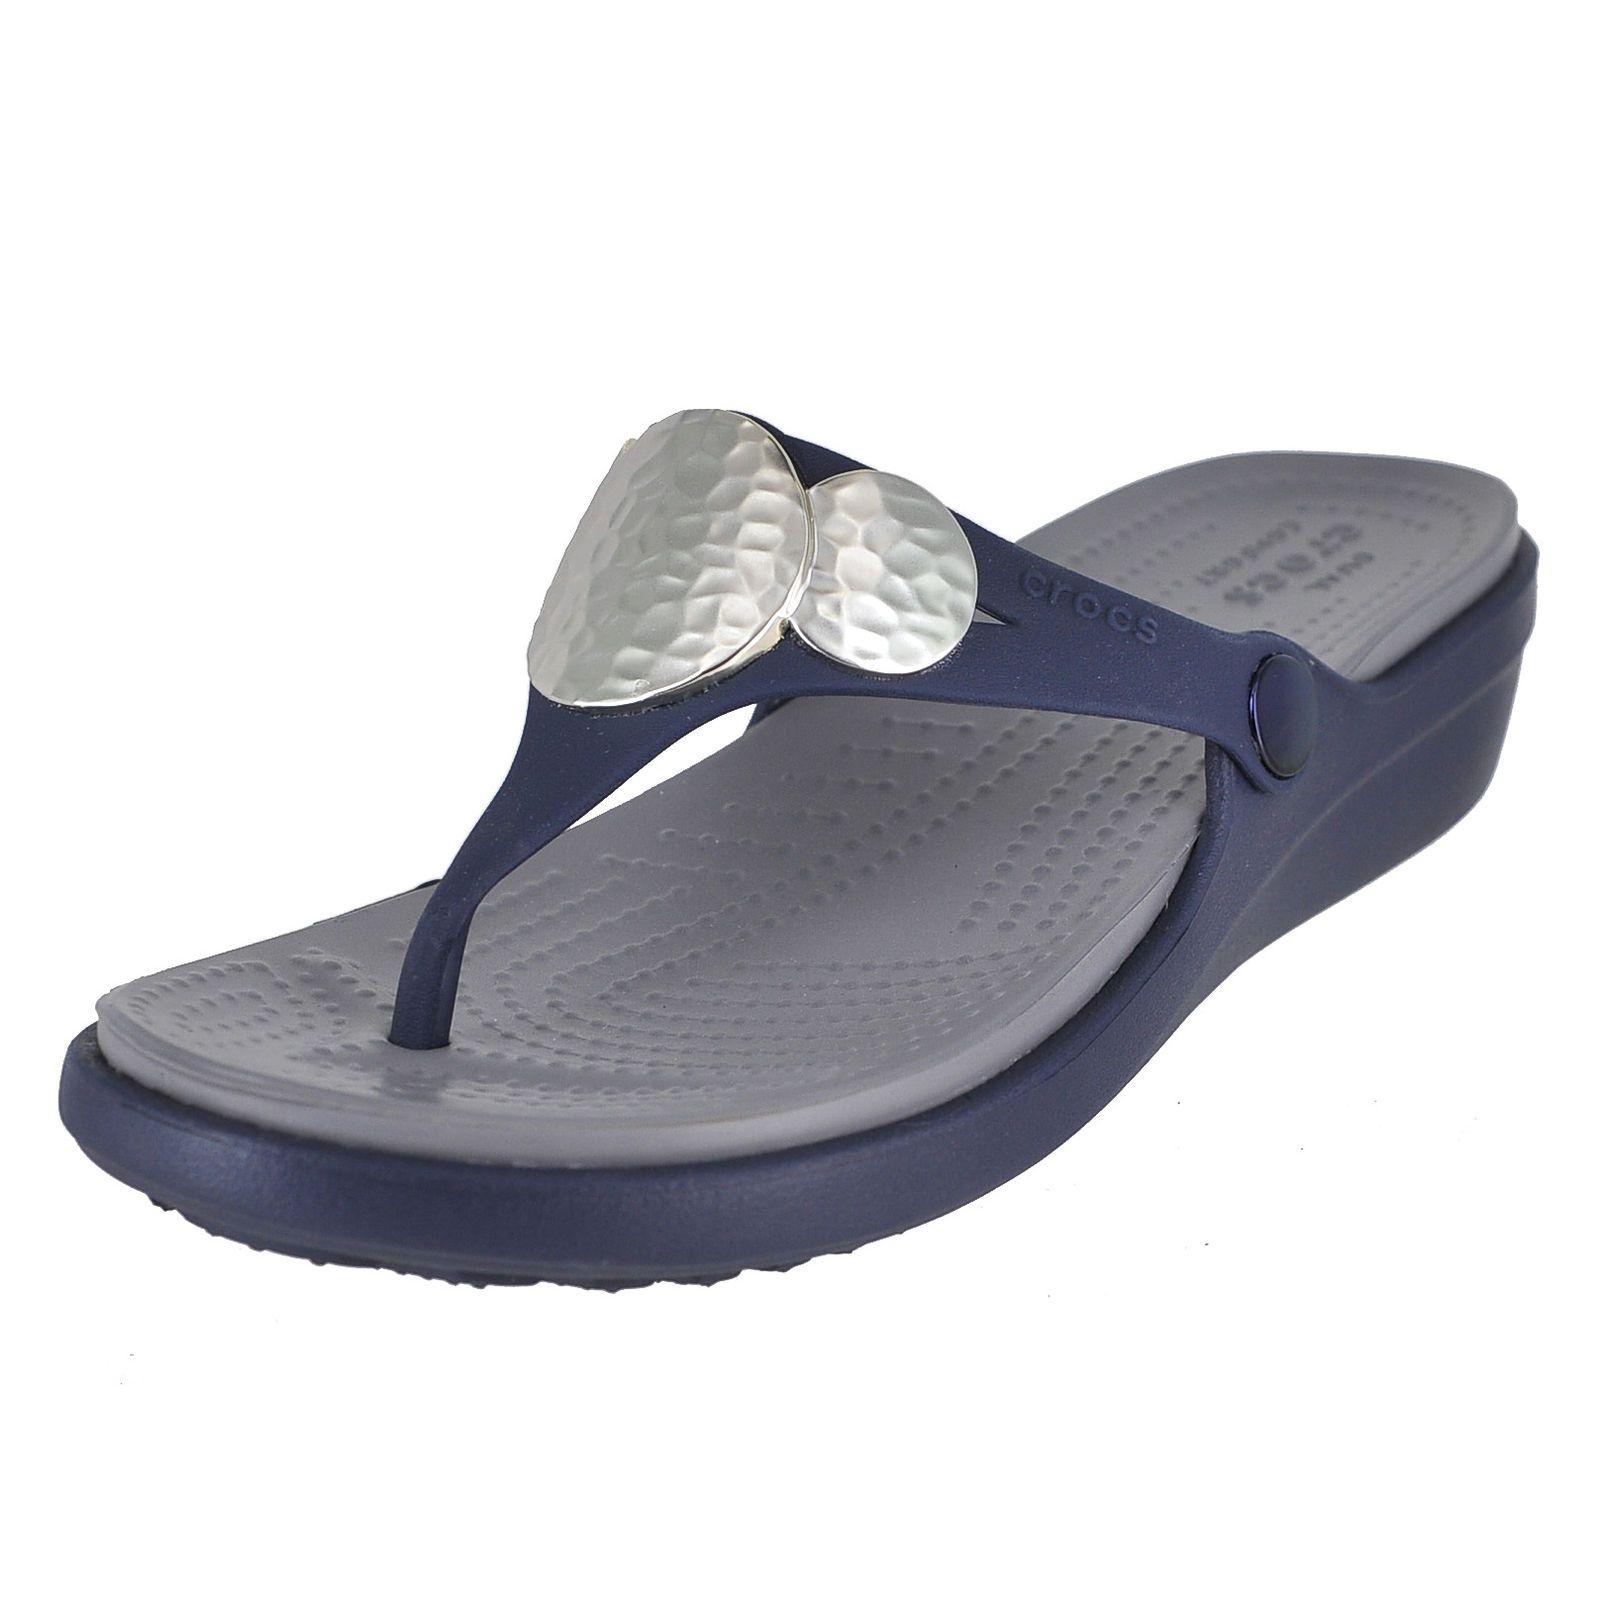 15d3b044f334 Crocs sanrah embellished wedge flip navy womens flip flop size jpg  1600x1600 Crocs sanrah